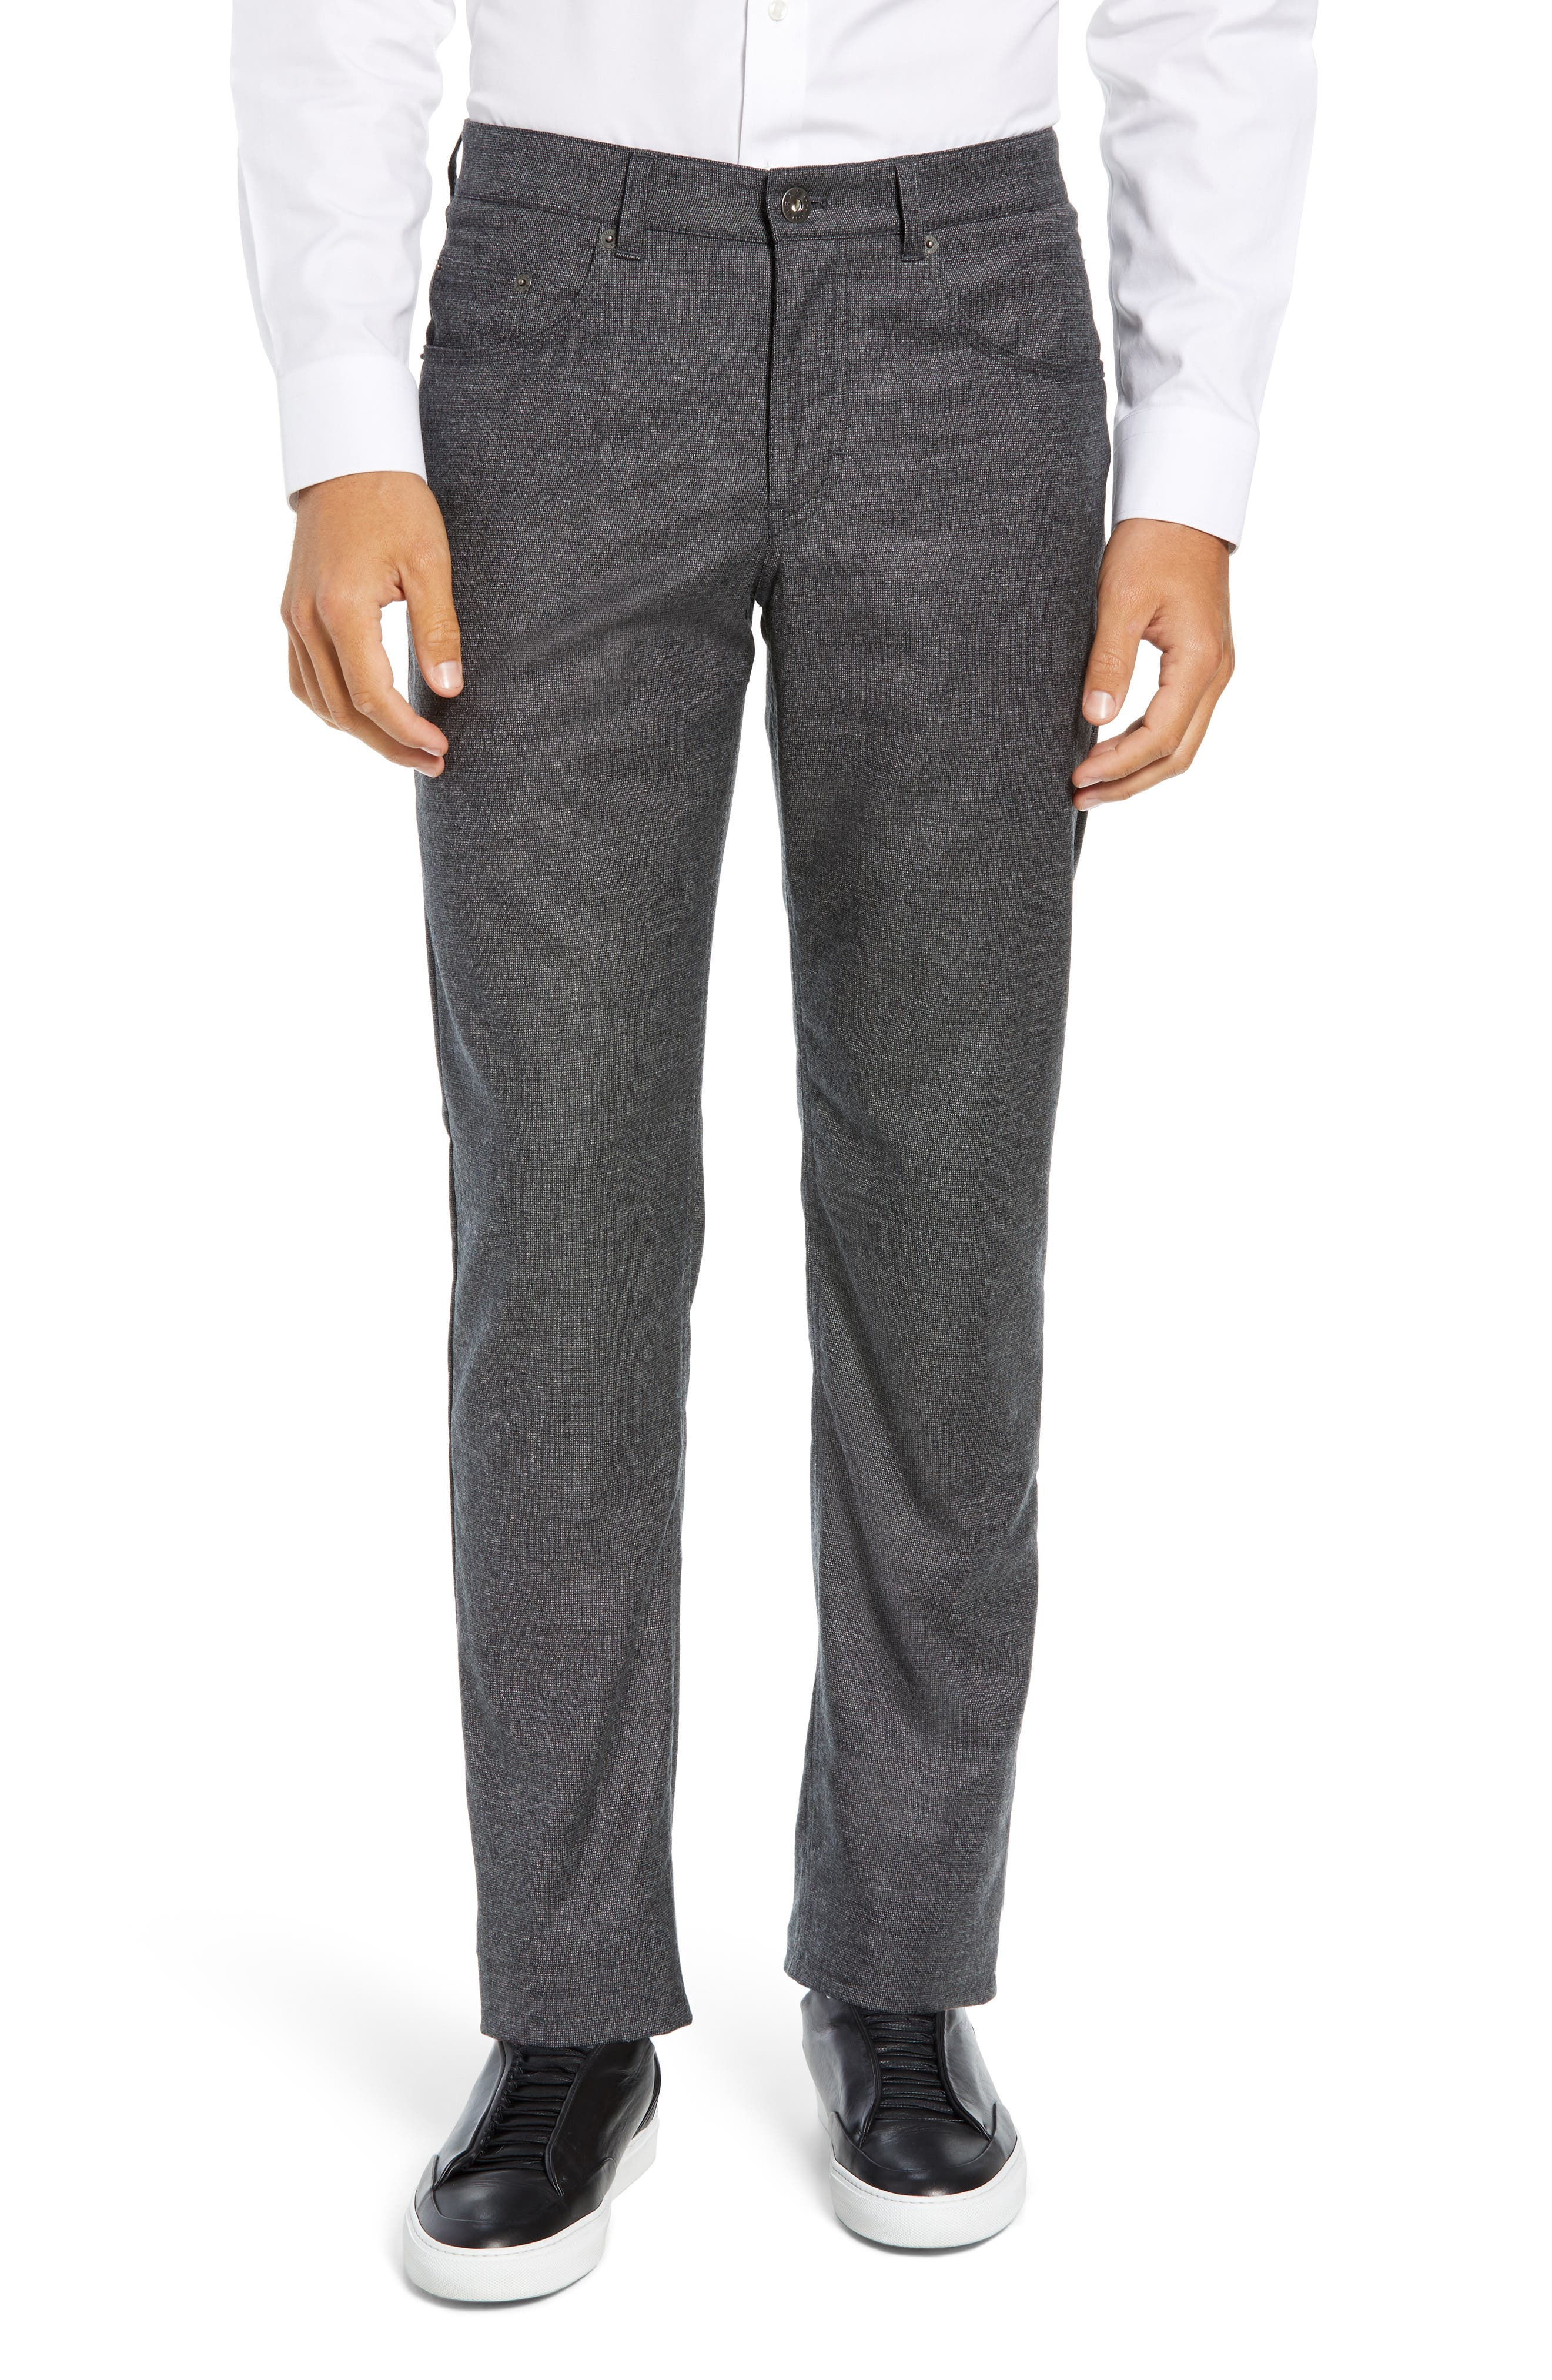 Cadiz Five Pocket Stretch Wool Trousers,                         Main,                         color, GRAPHITE